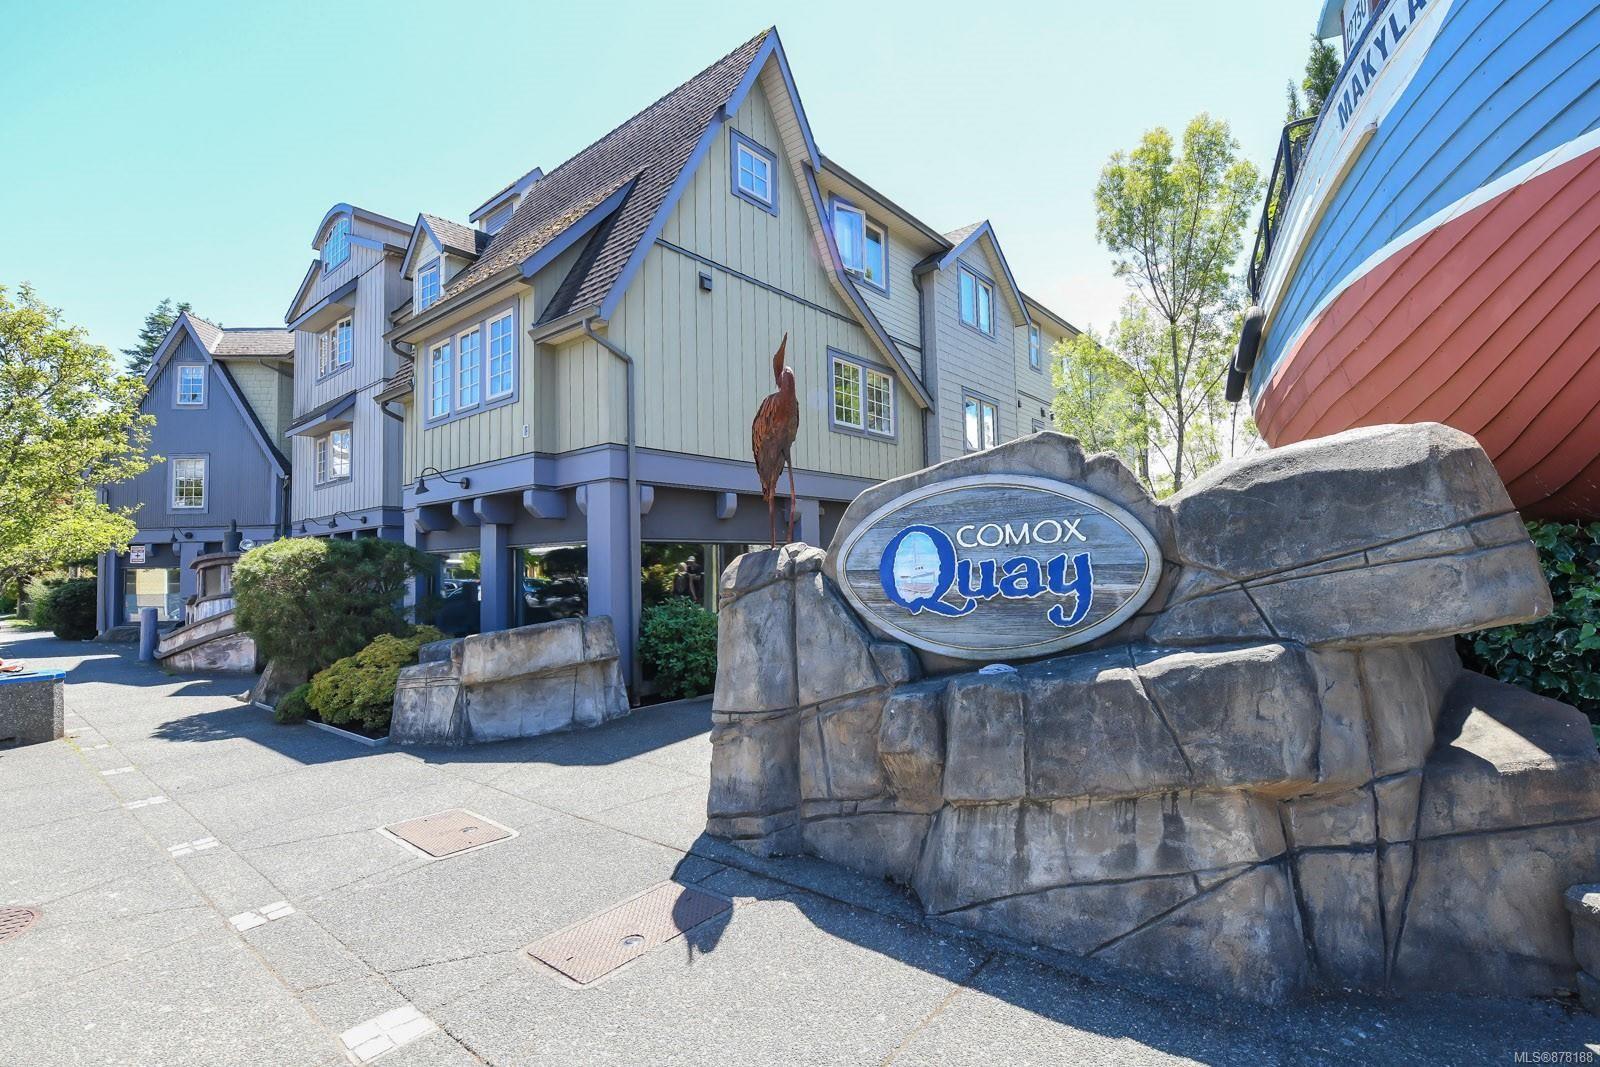 Main Photo: 201 1695 Comox Ave in : CV Comox (Town of) Condo for sale (Comox Valley)  : MLS®# 878188